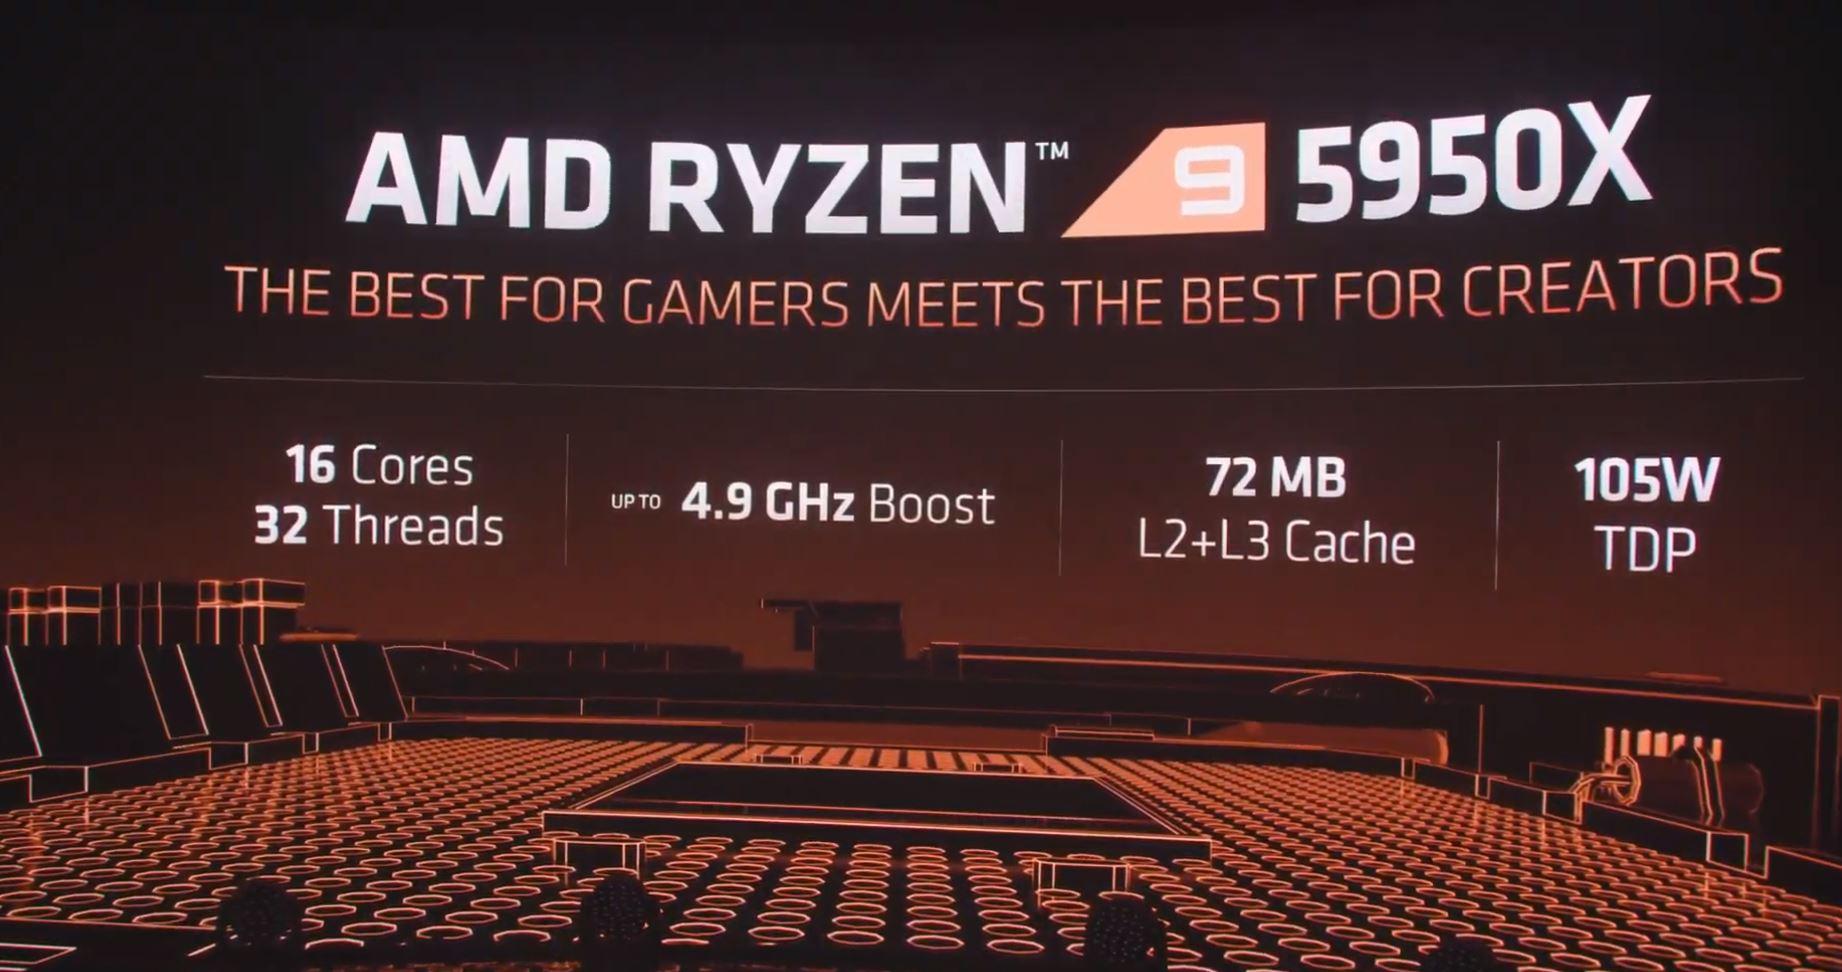 AMD Ryzen 5950X Specs